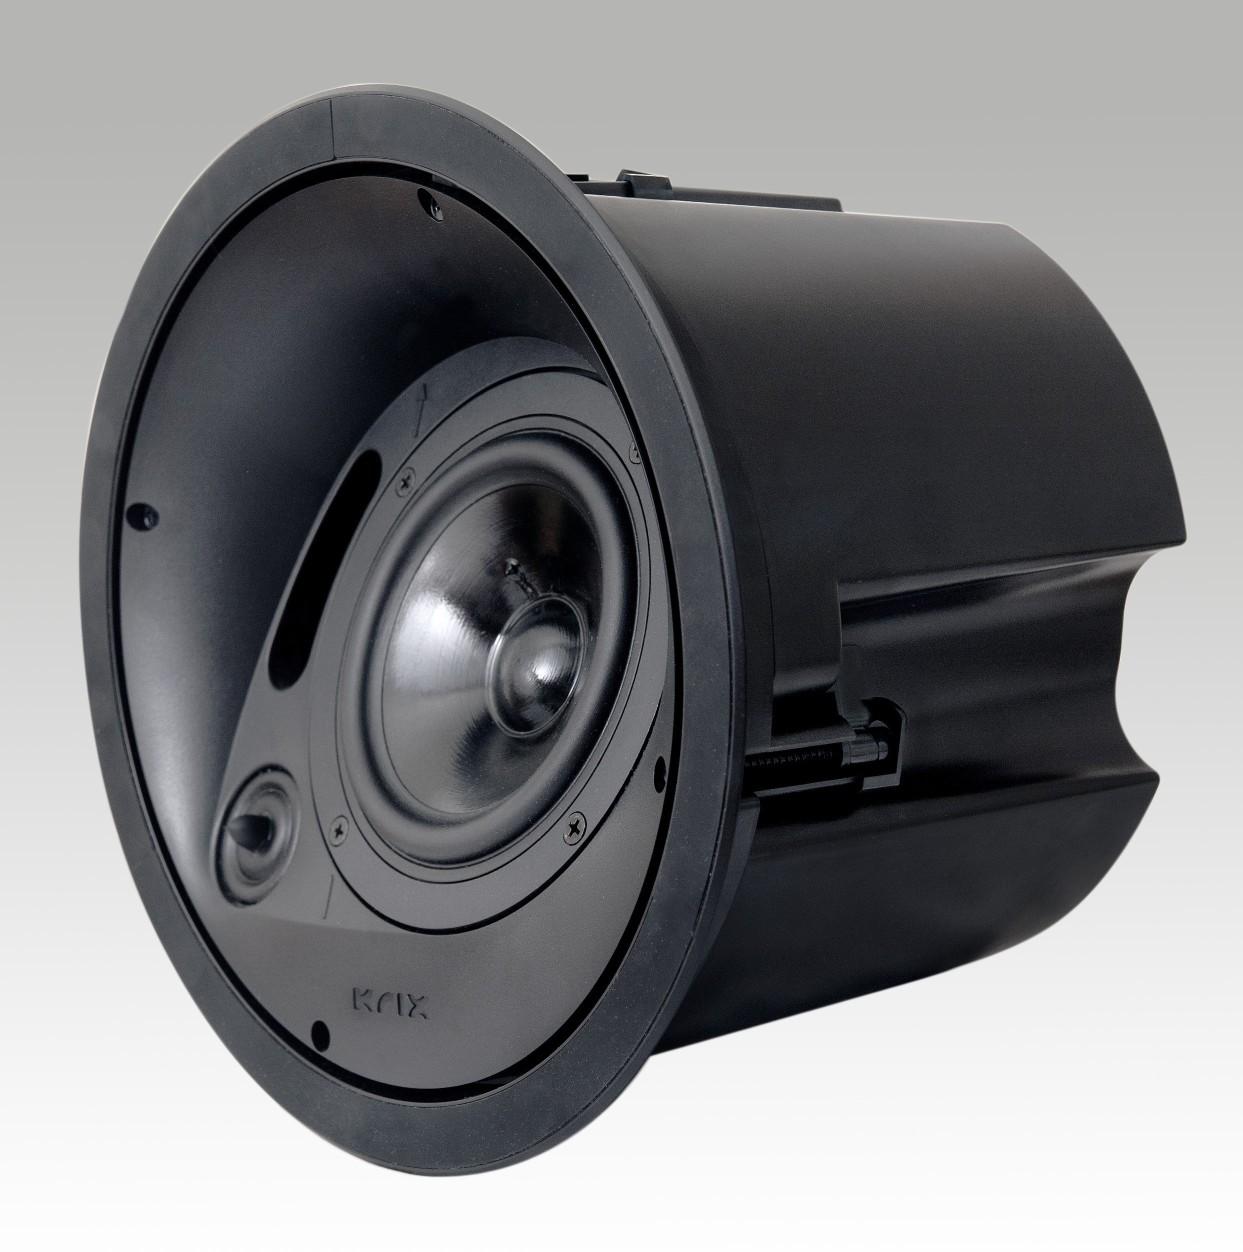 Canarm bpt18 34a 1 bathroom exhaust fan - Download